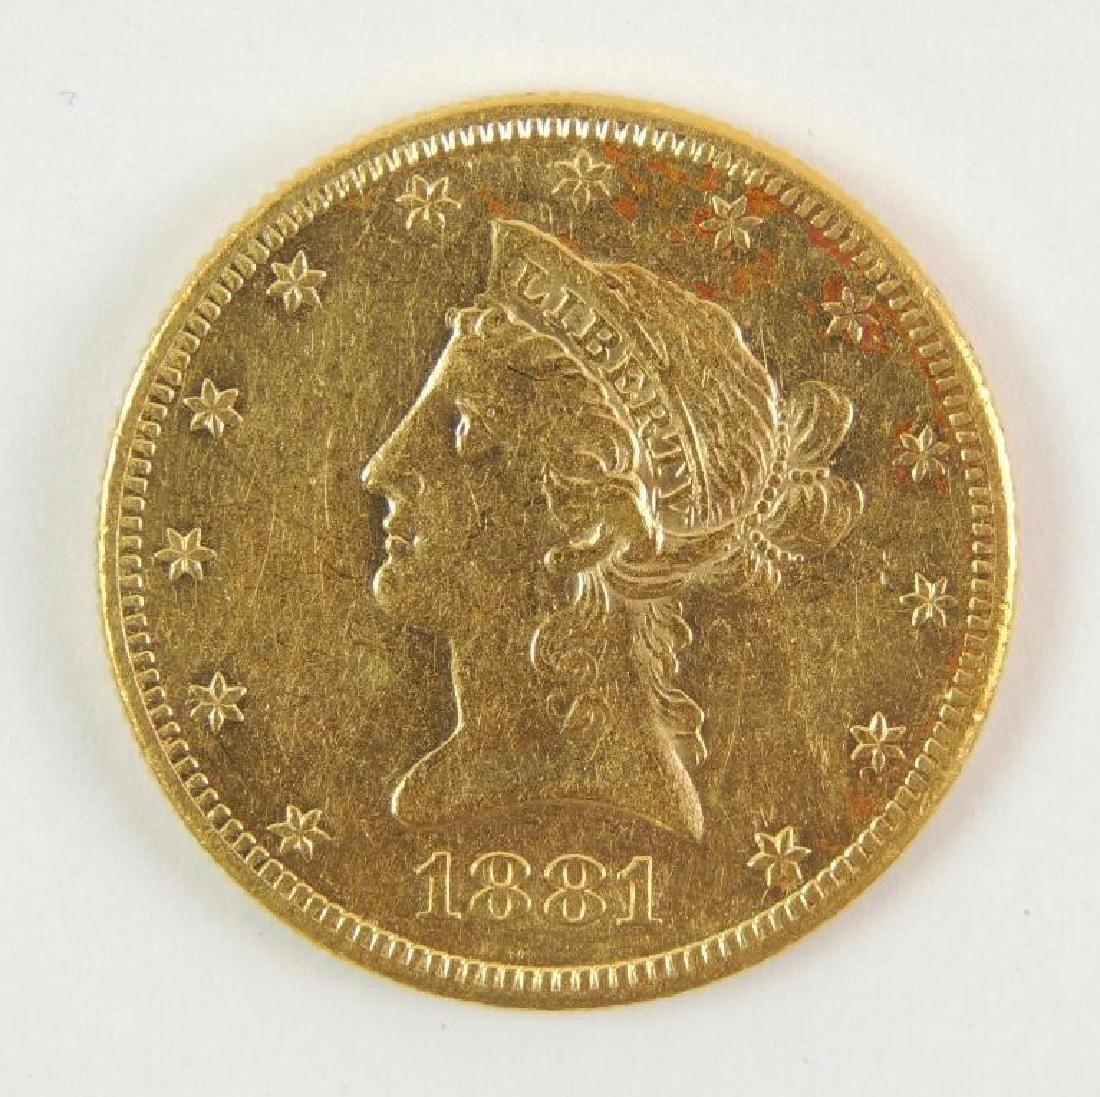 1881-S Liberty Eagle $10 Gold Coin